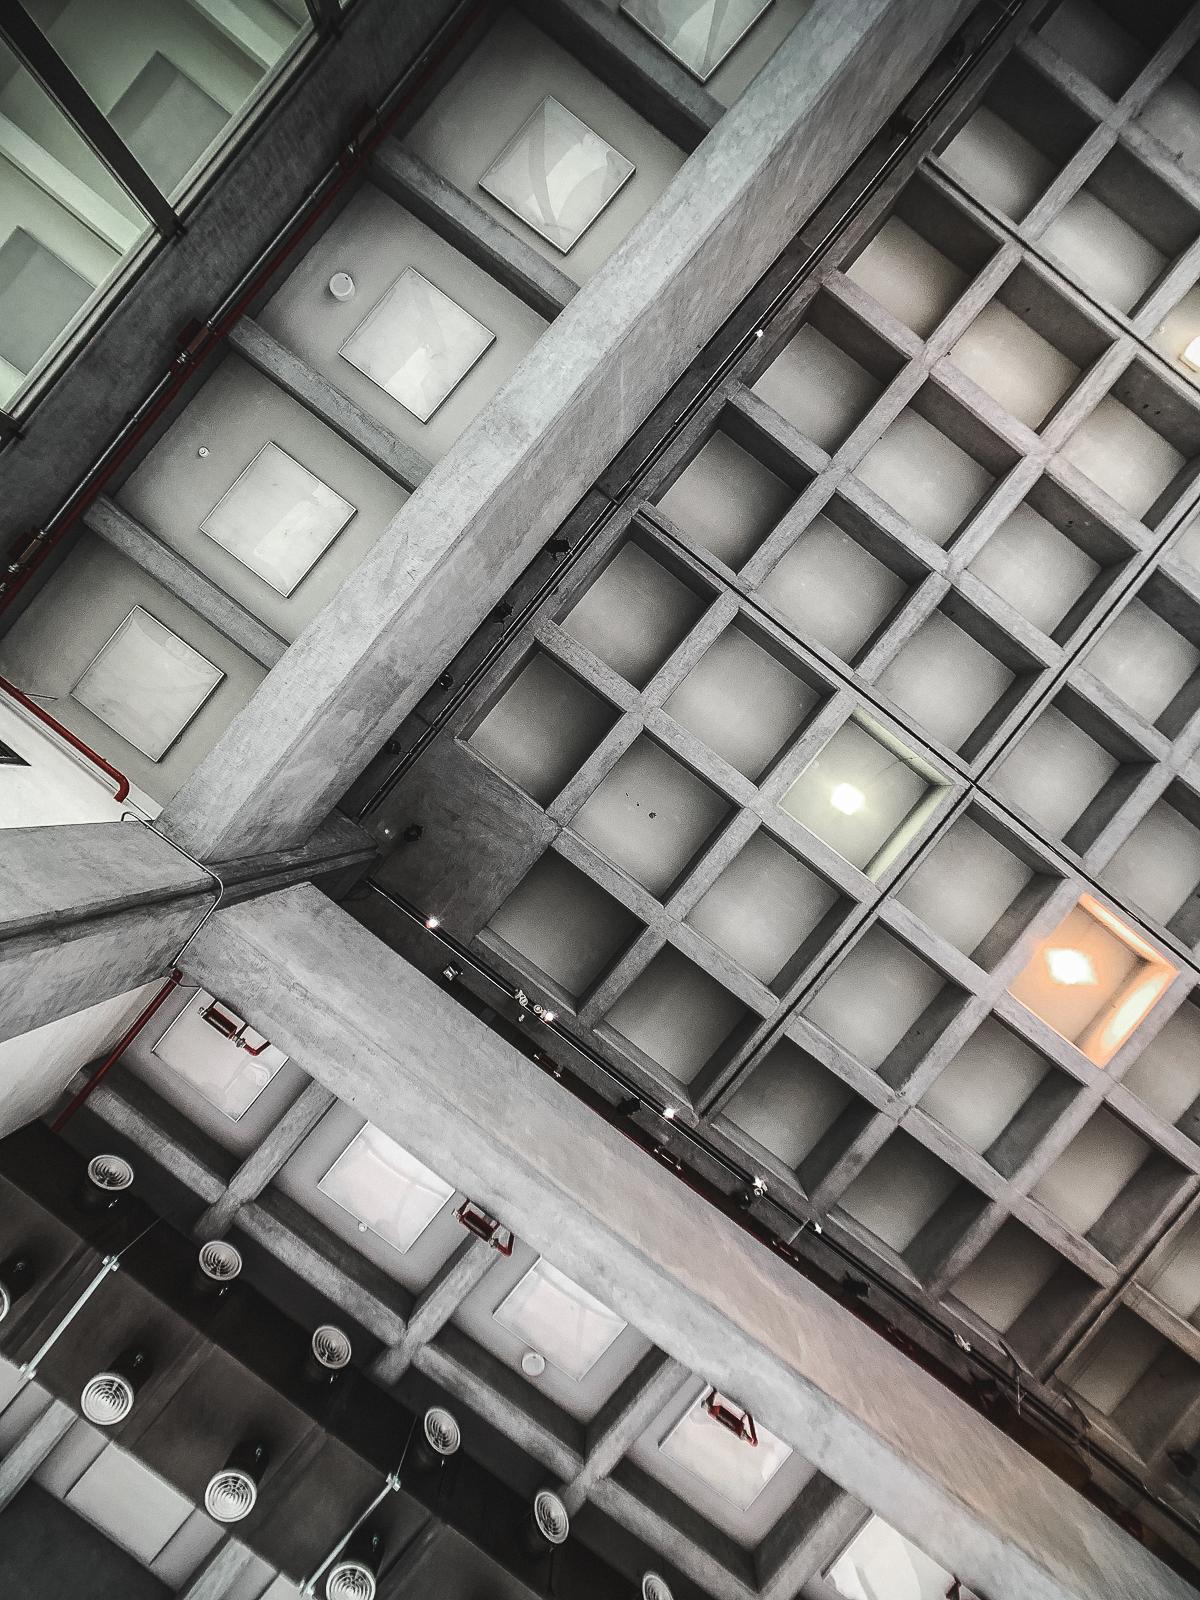 2019 Sep. bitplay 建築空間攝影工作坊北美館 - iPhone XS Max - Yes! Please Enjoy by Fanning Tseng-5.jpg